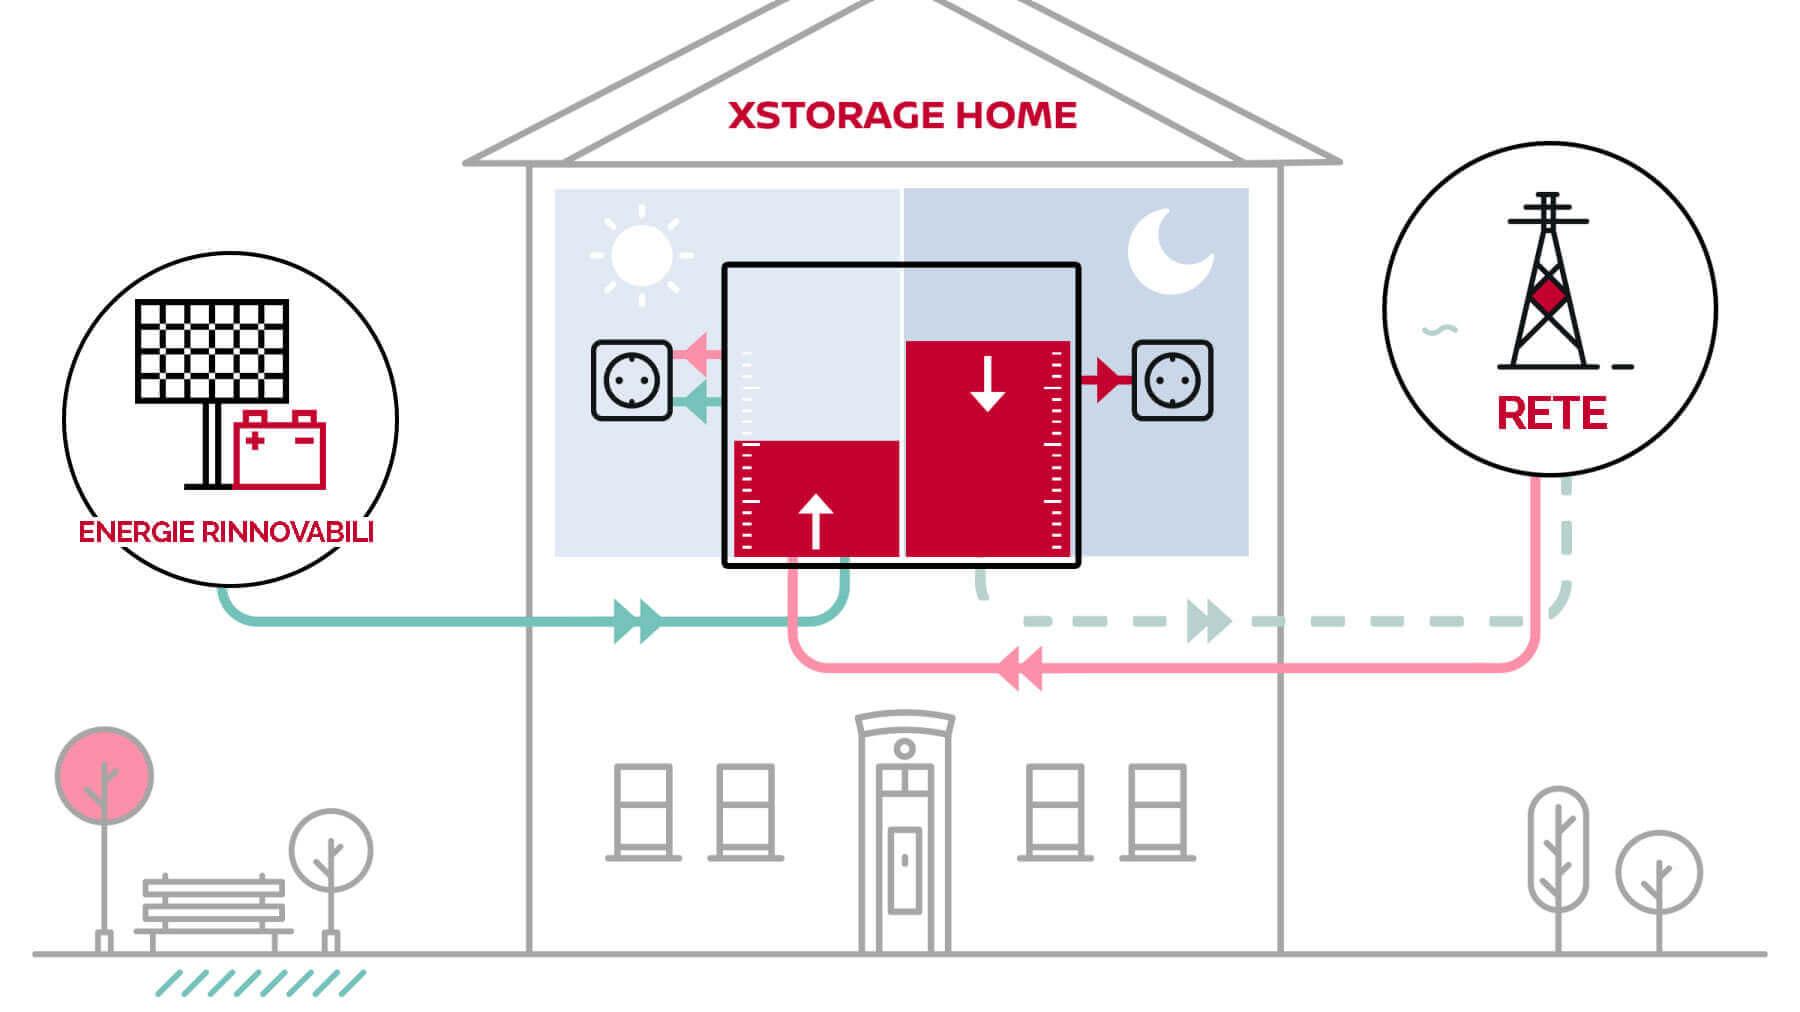 xStorage Home Nissan Infografica